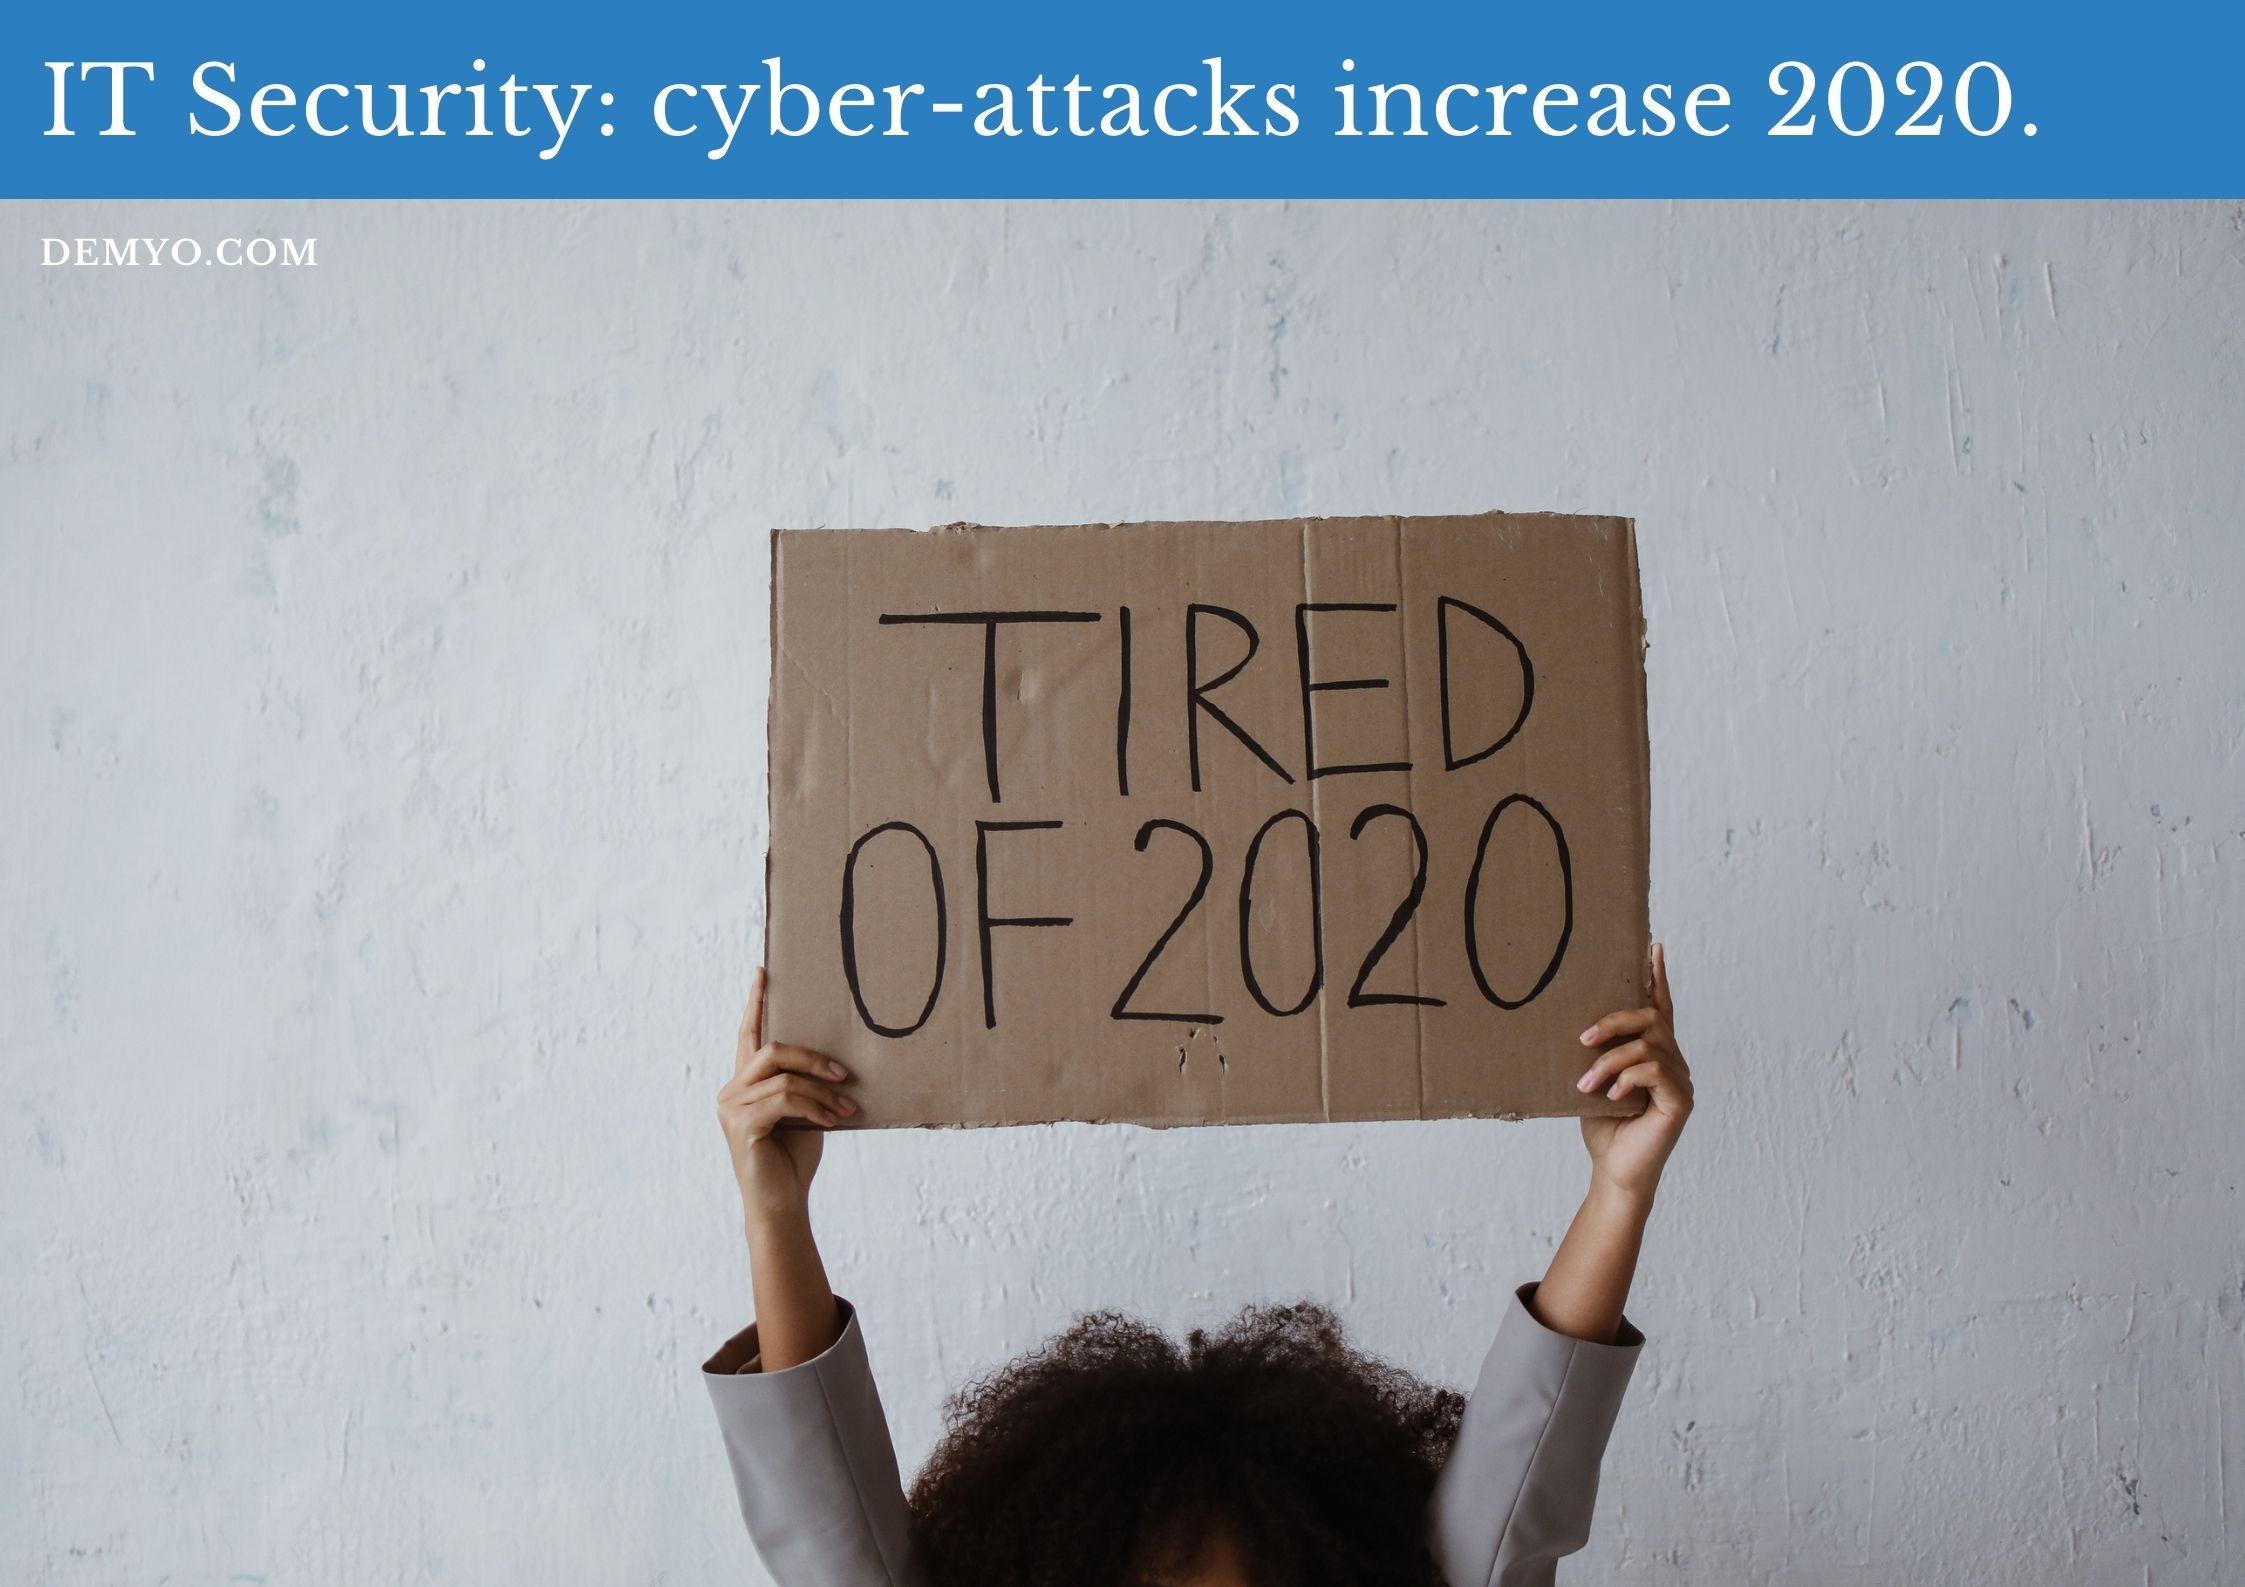 cyber-attacks increase